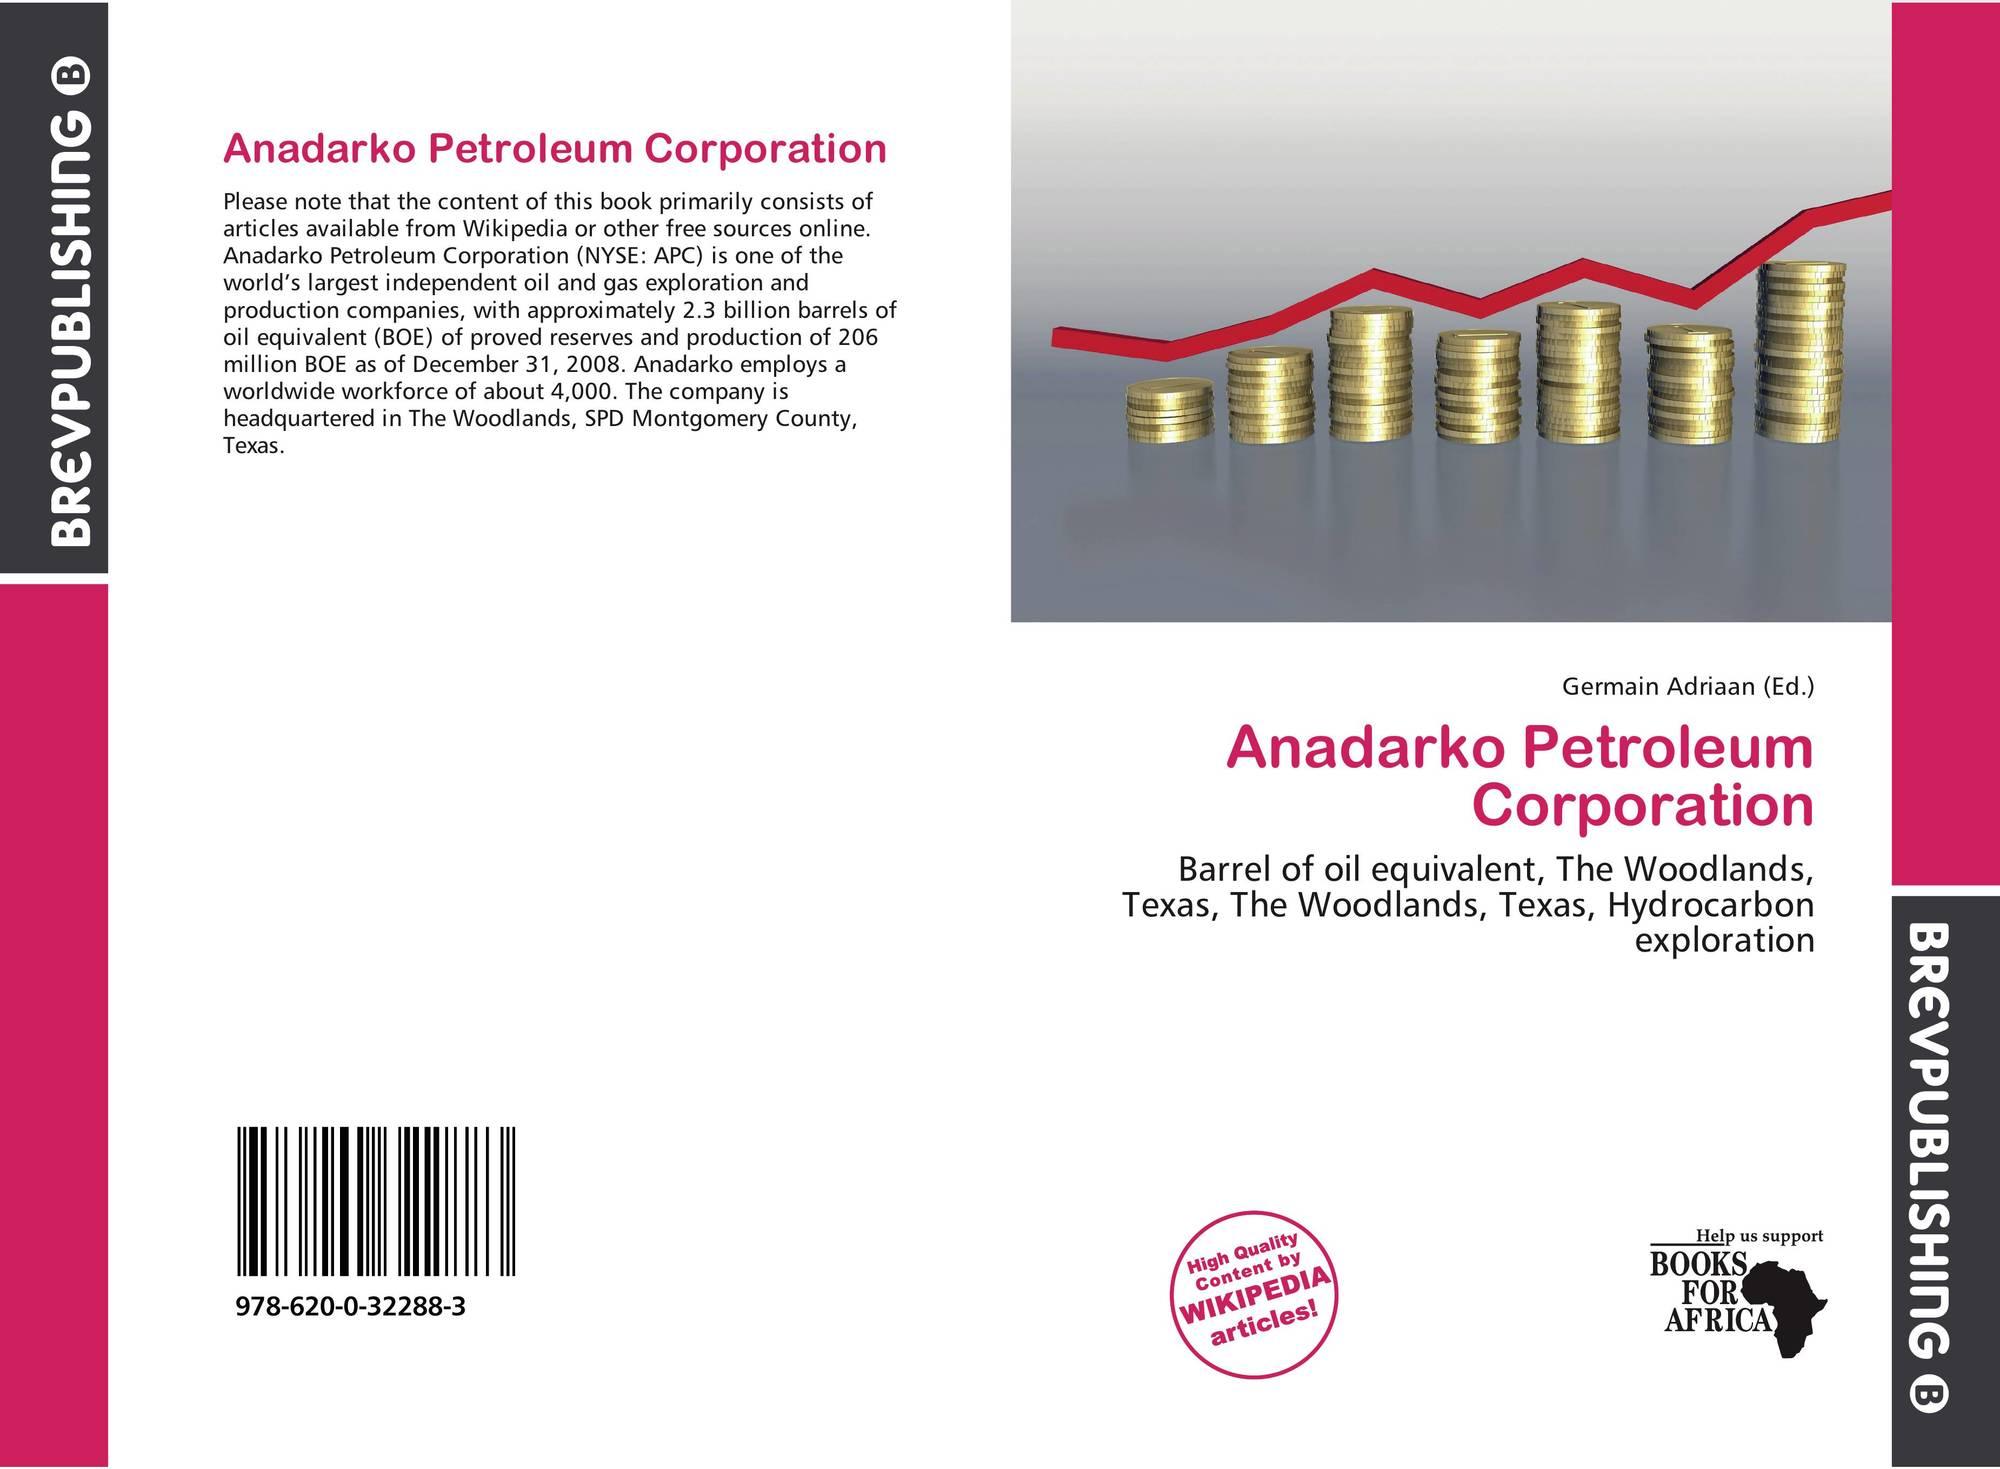 Anadarko Petroleum Corporation, 978-620-0-32288-3